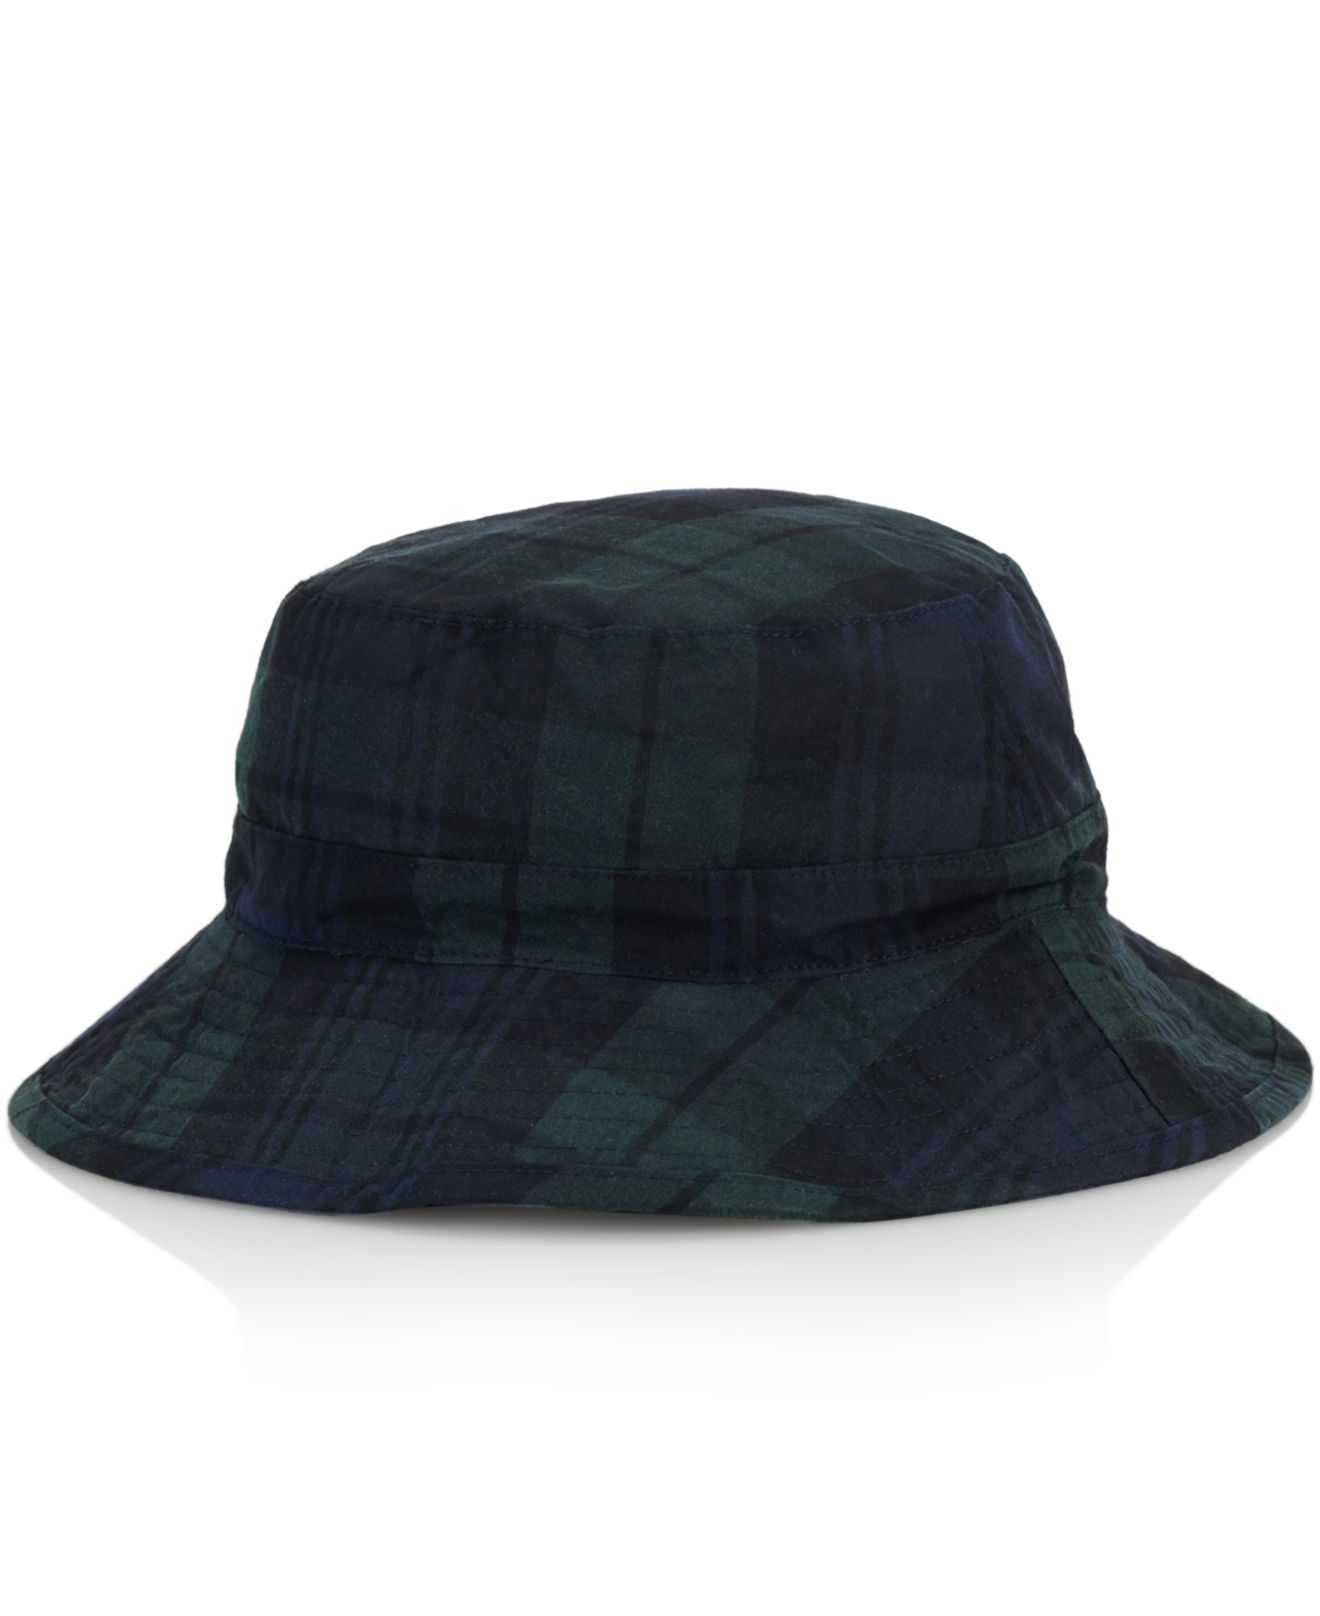 Lyst - Polo Ralph Lauren Tartan Oilcloth Bucket Hat in Black for Men 0b8b019b228